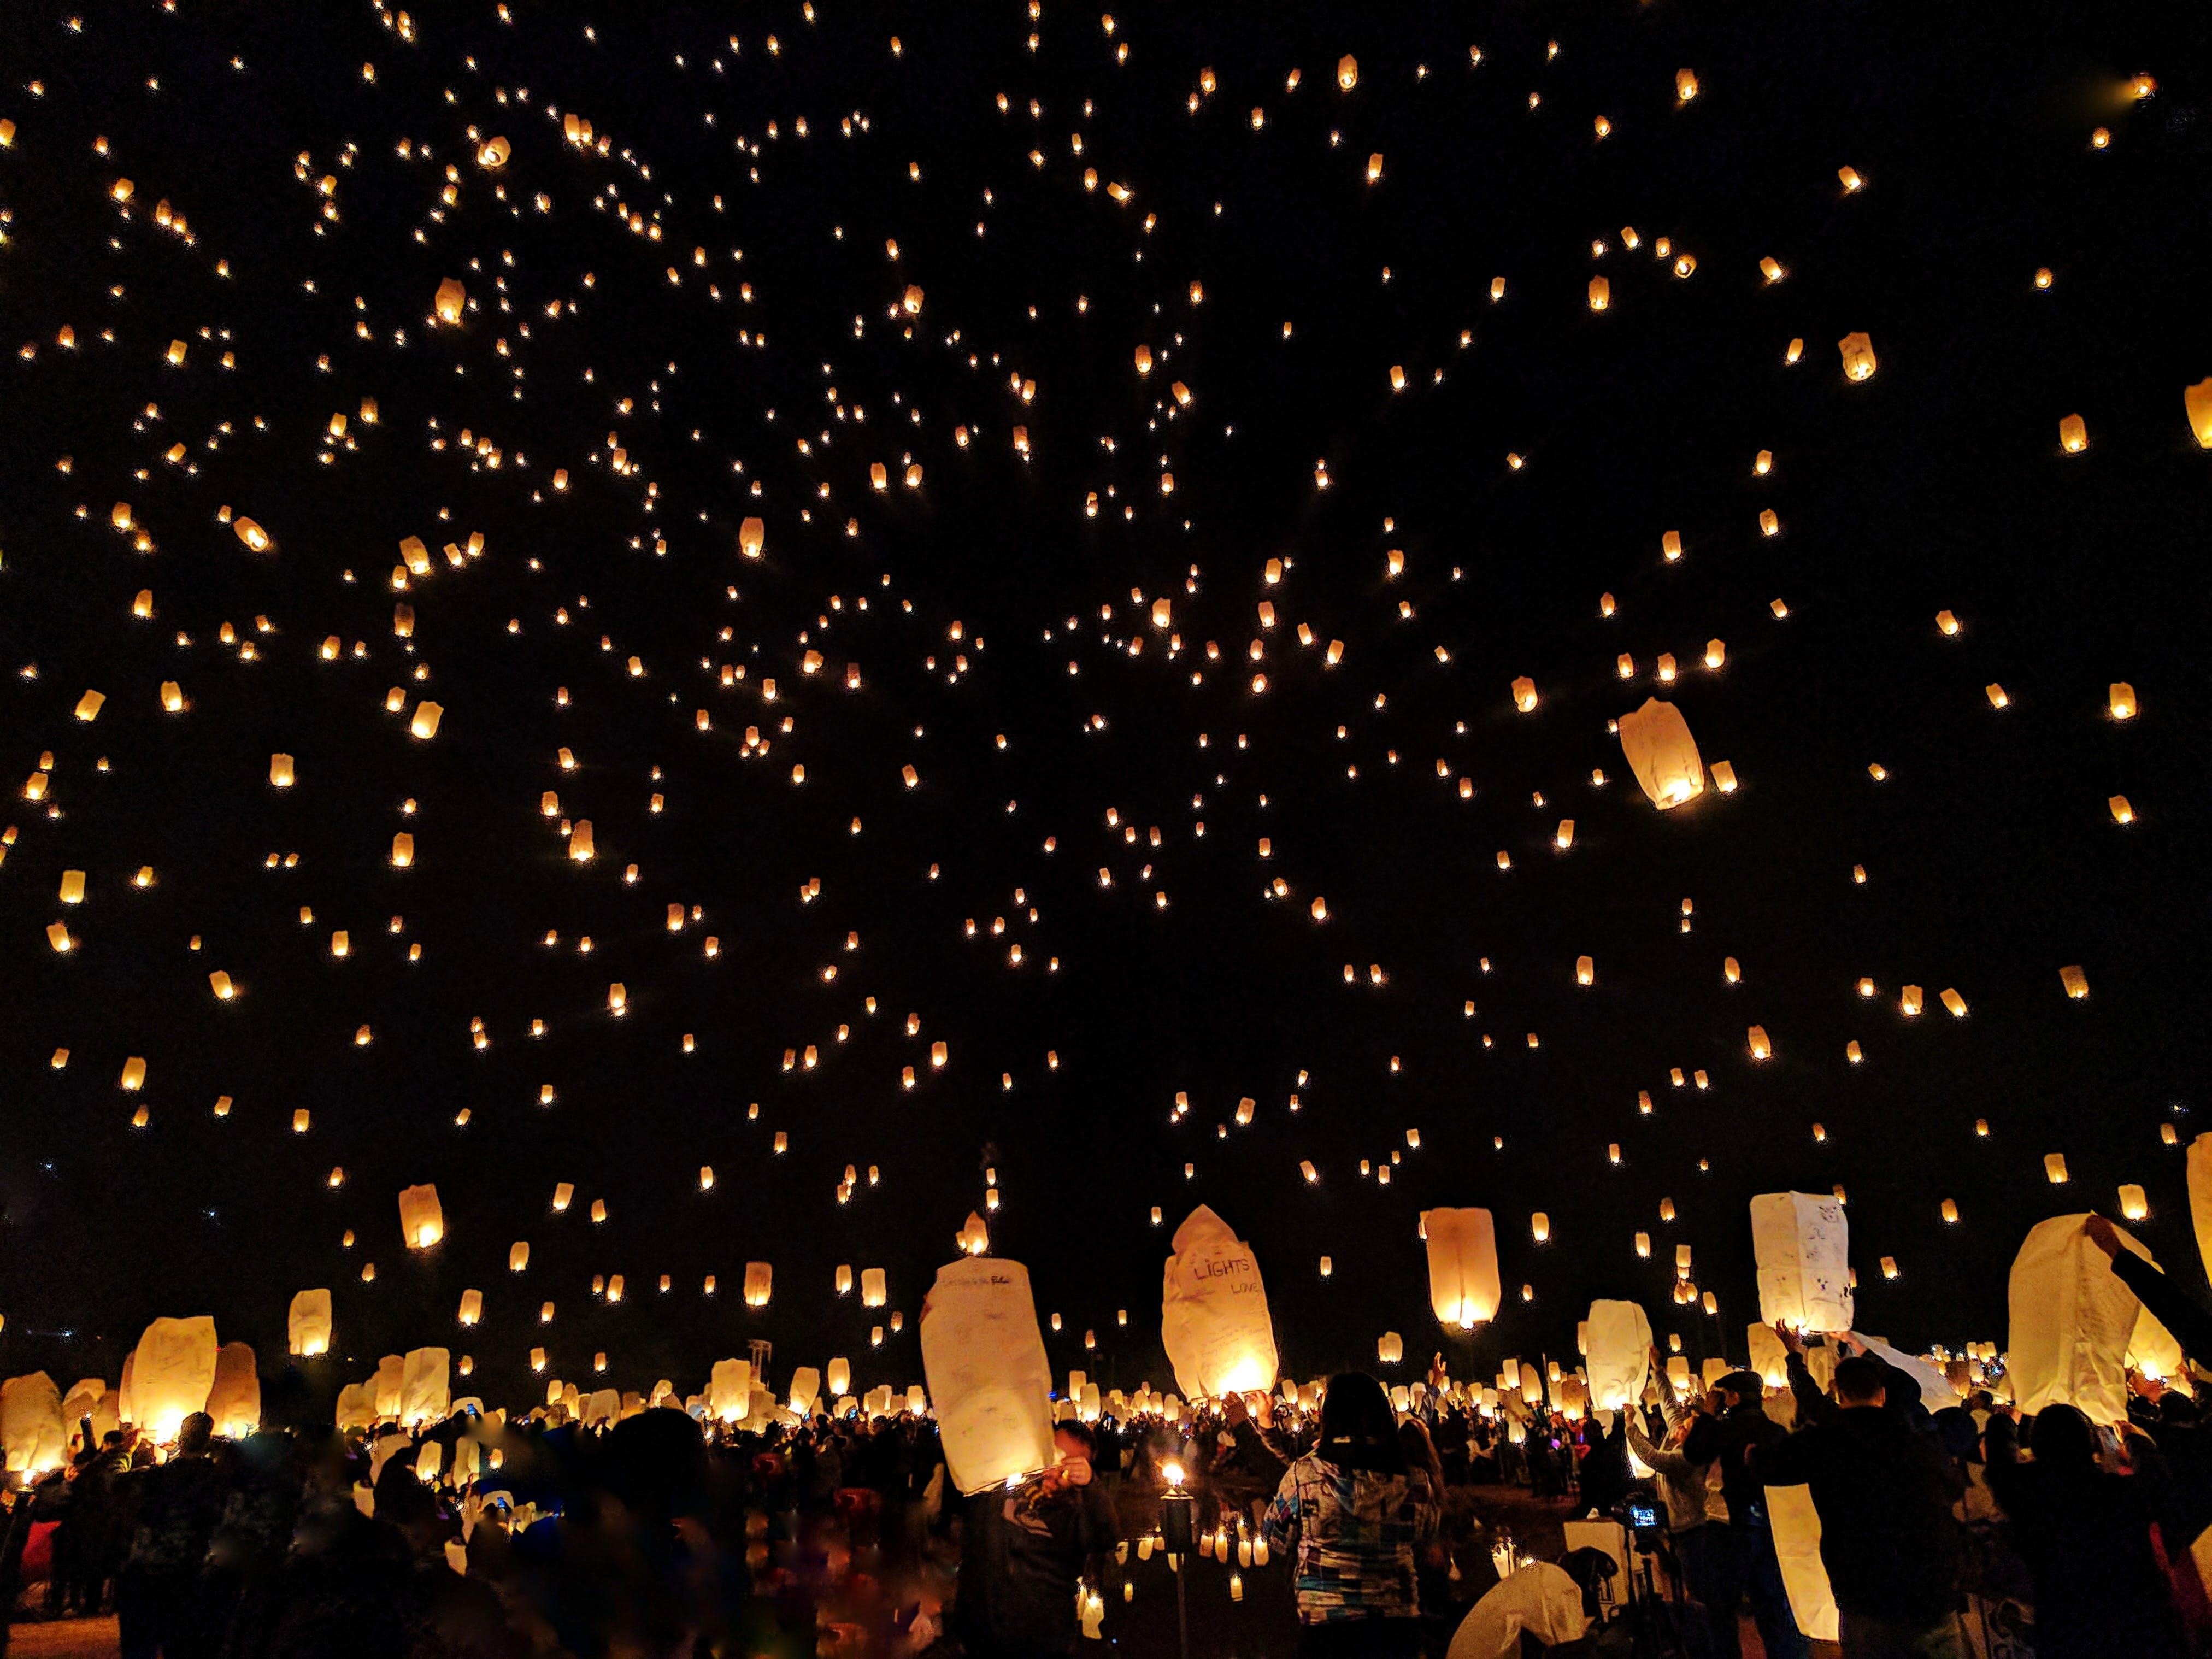 Kostenloses Stock Foto zu beleuchtet, beleuchtung, diwali, dunkel